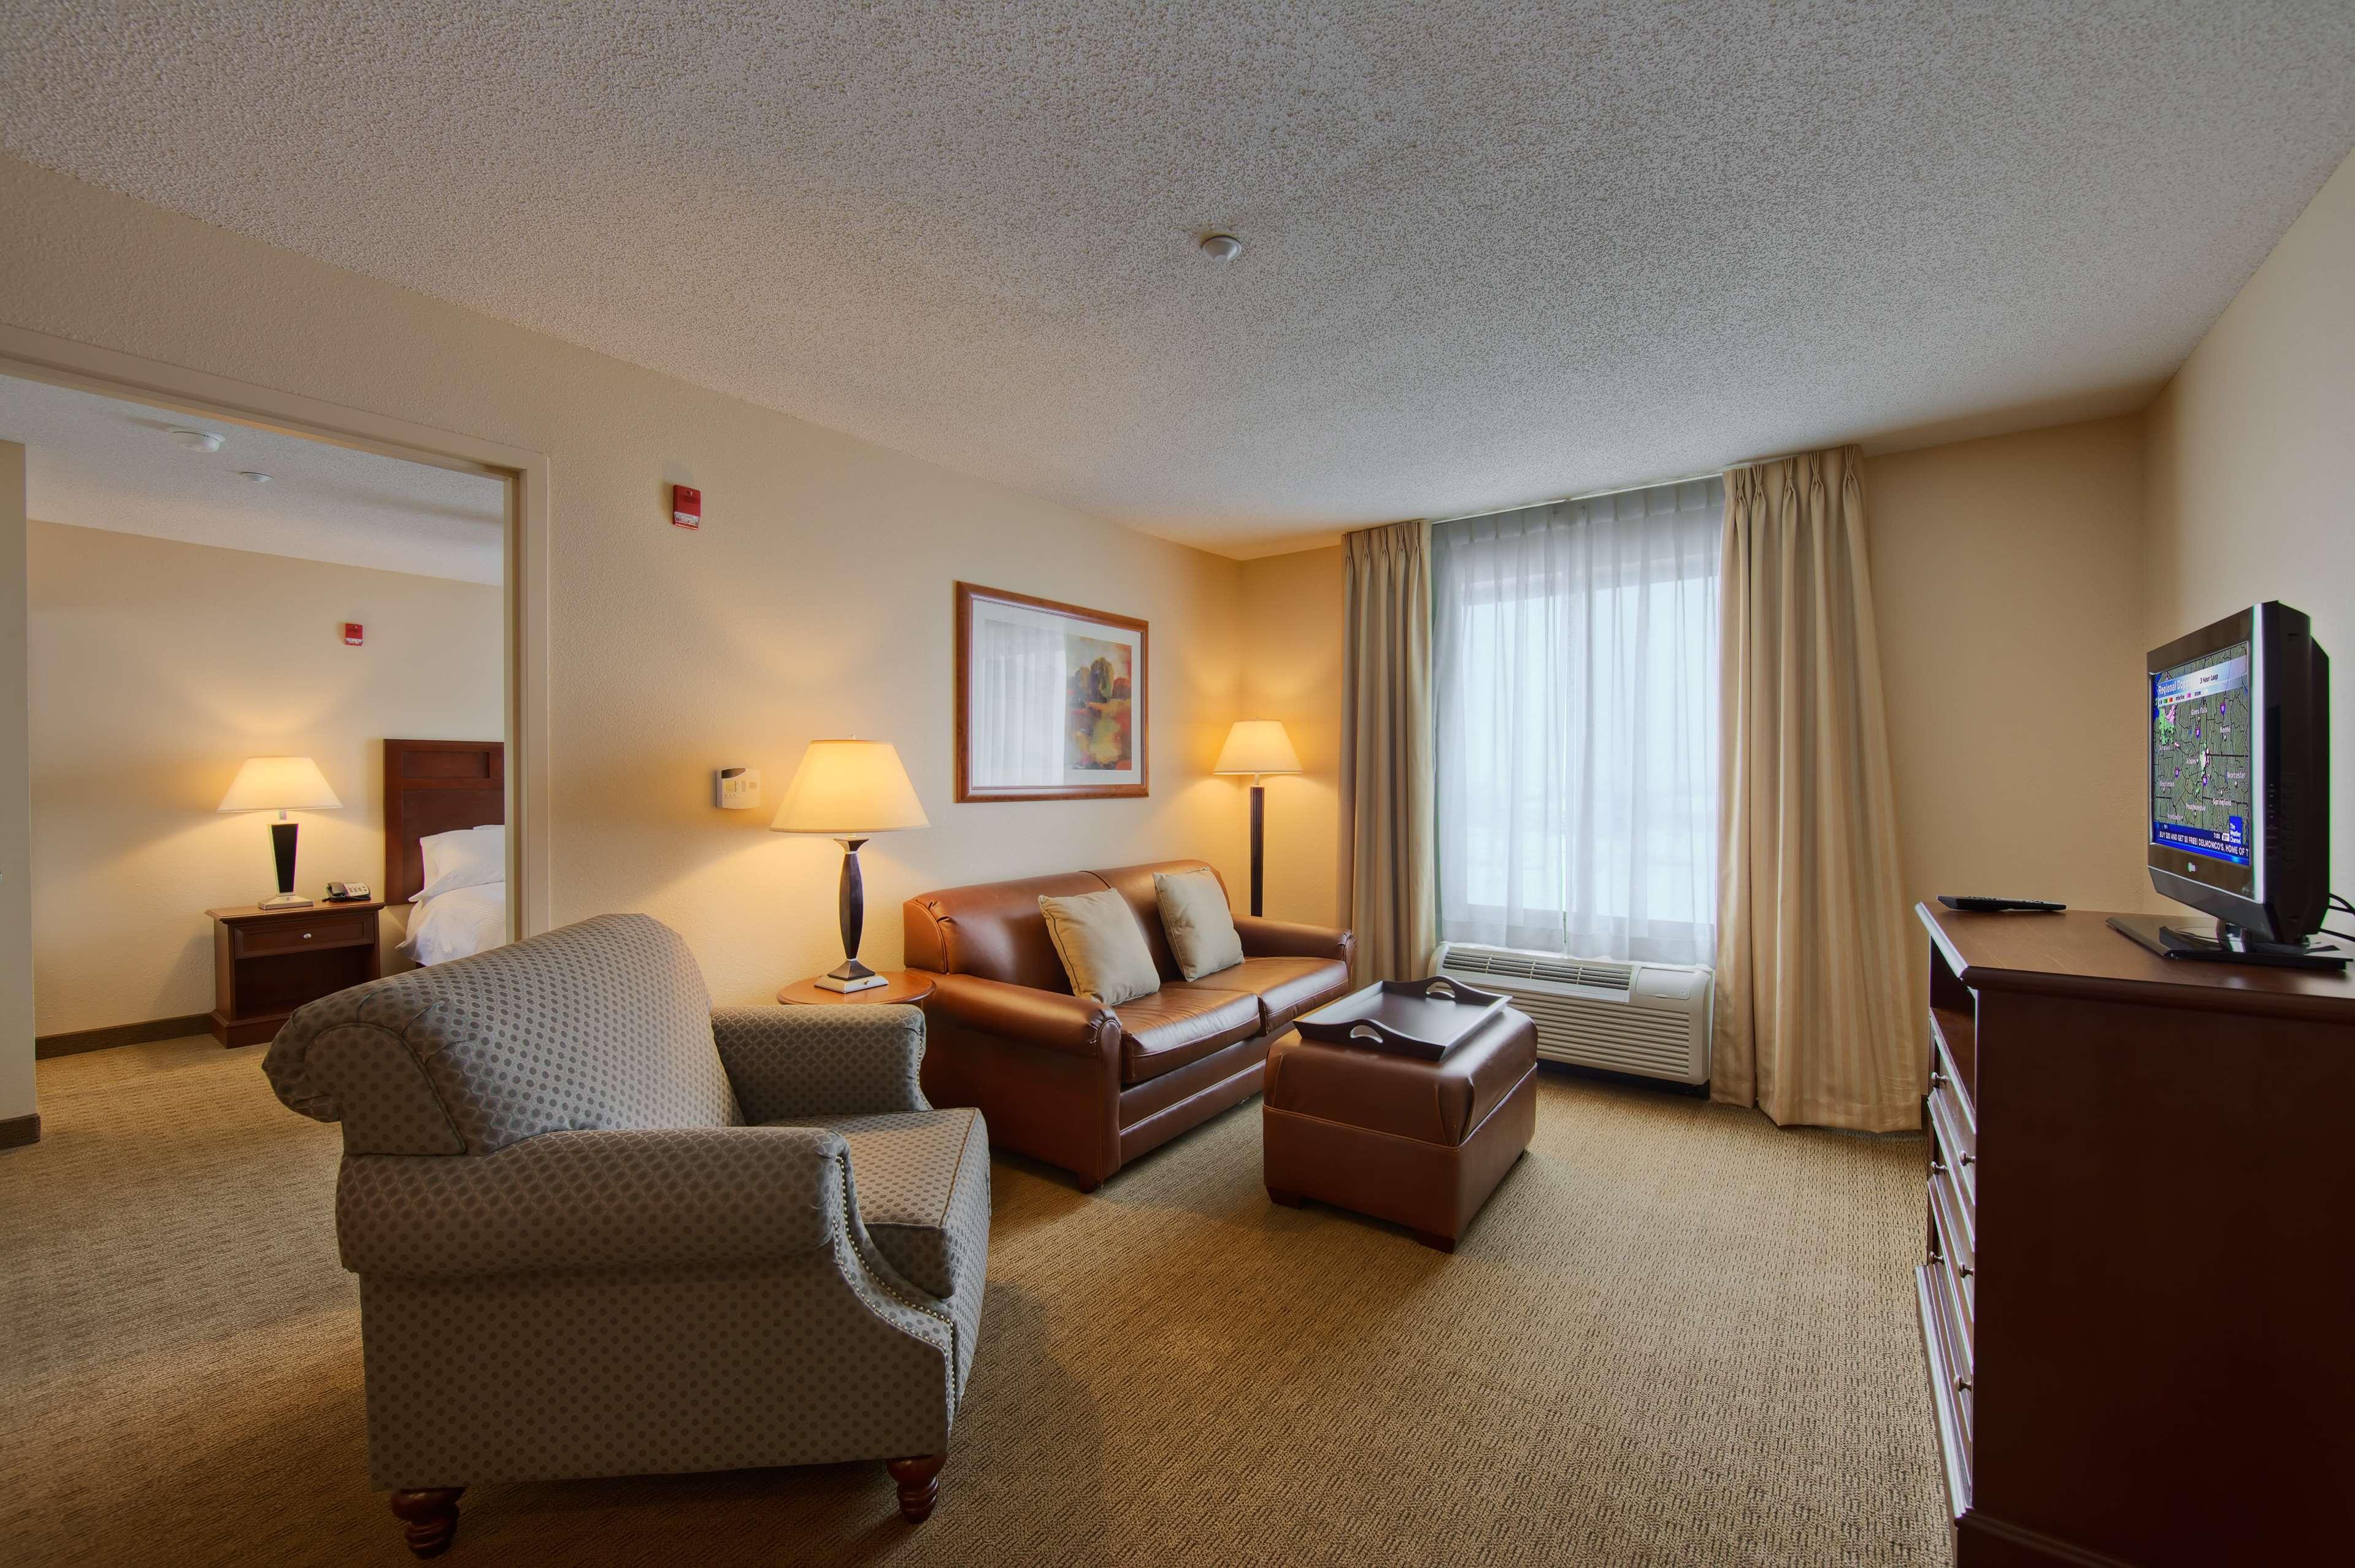 Homewood Suites by Hilton Orland Park image 27